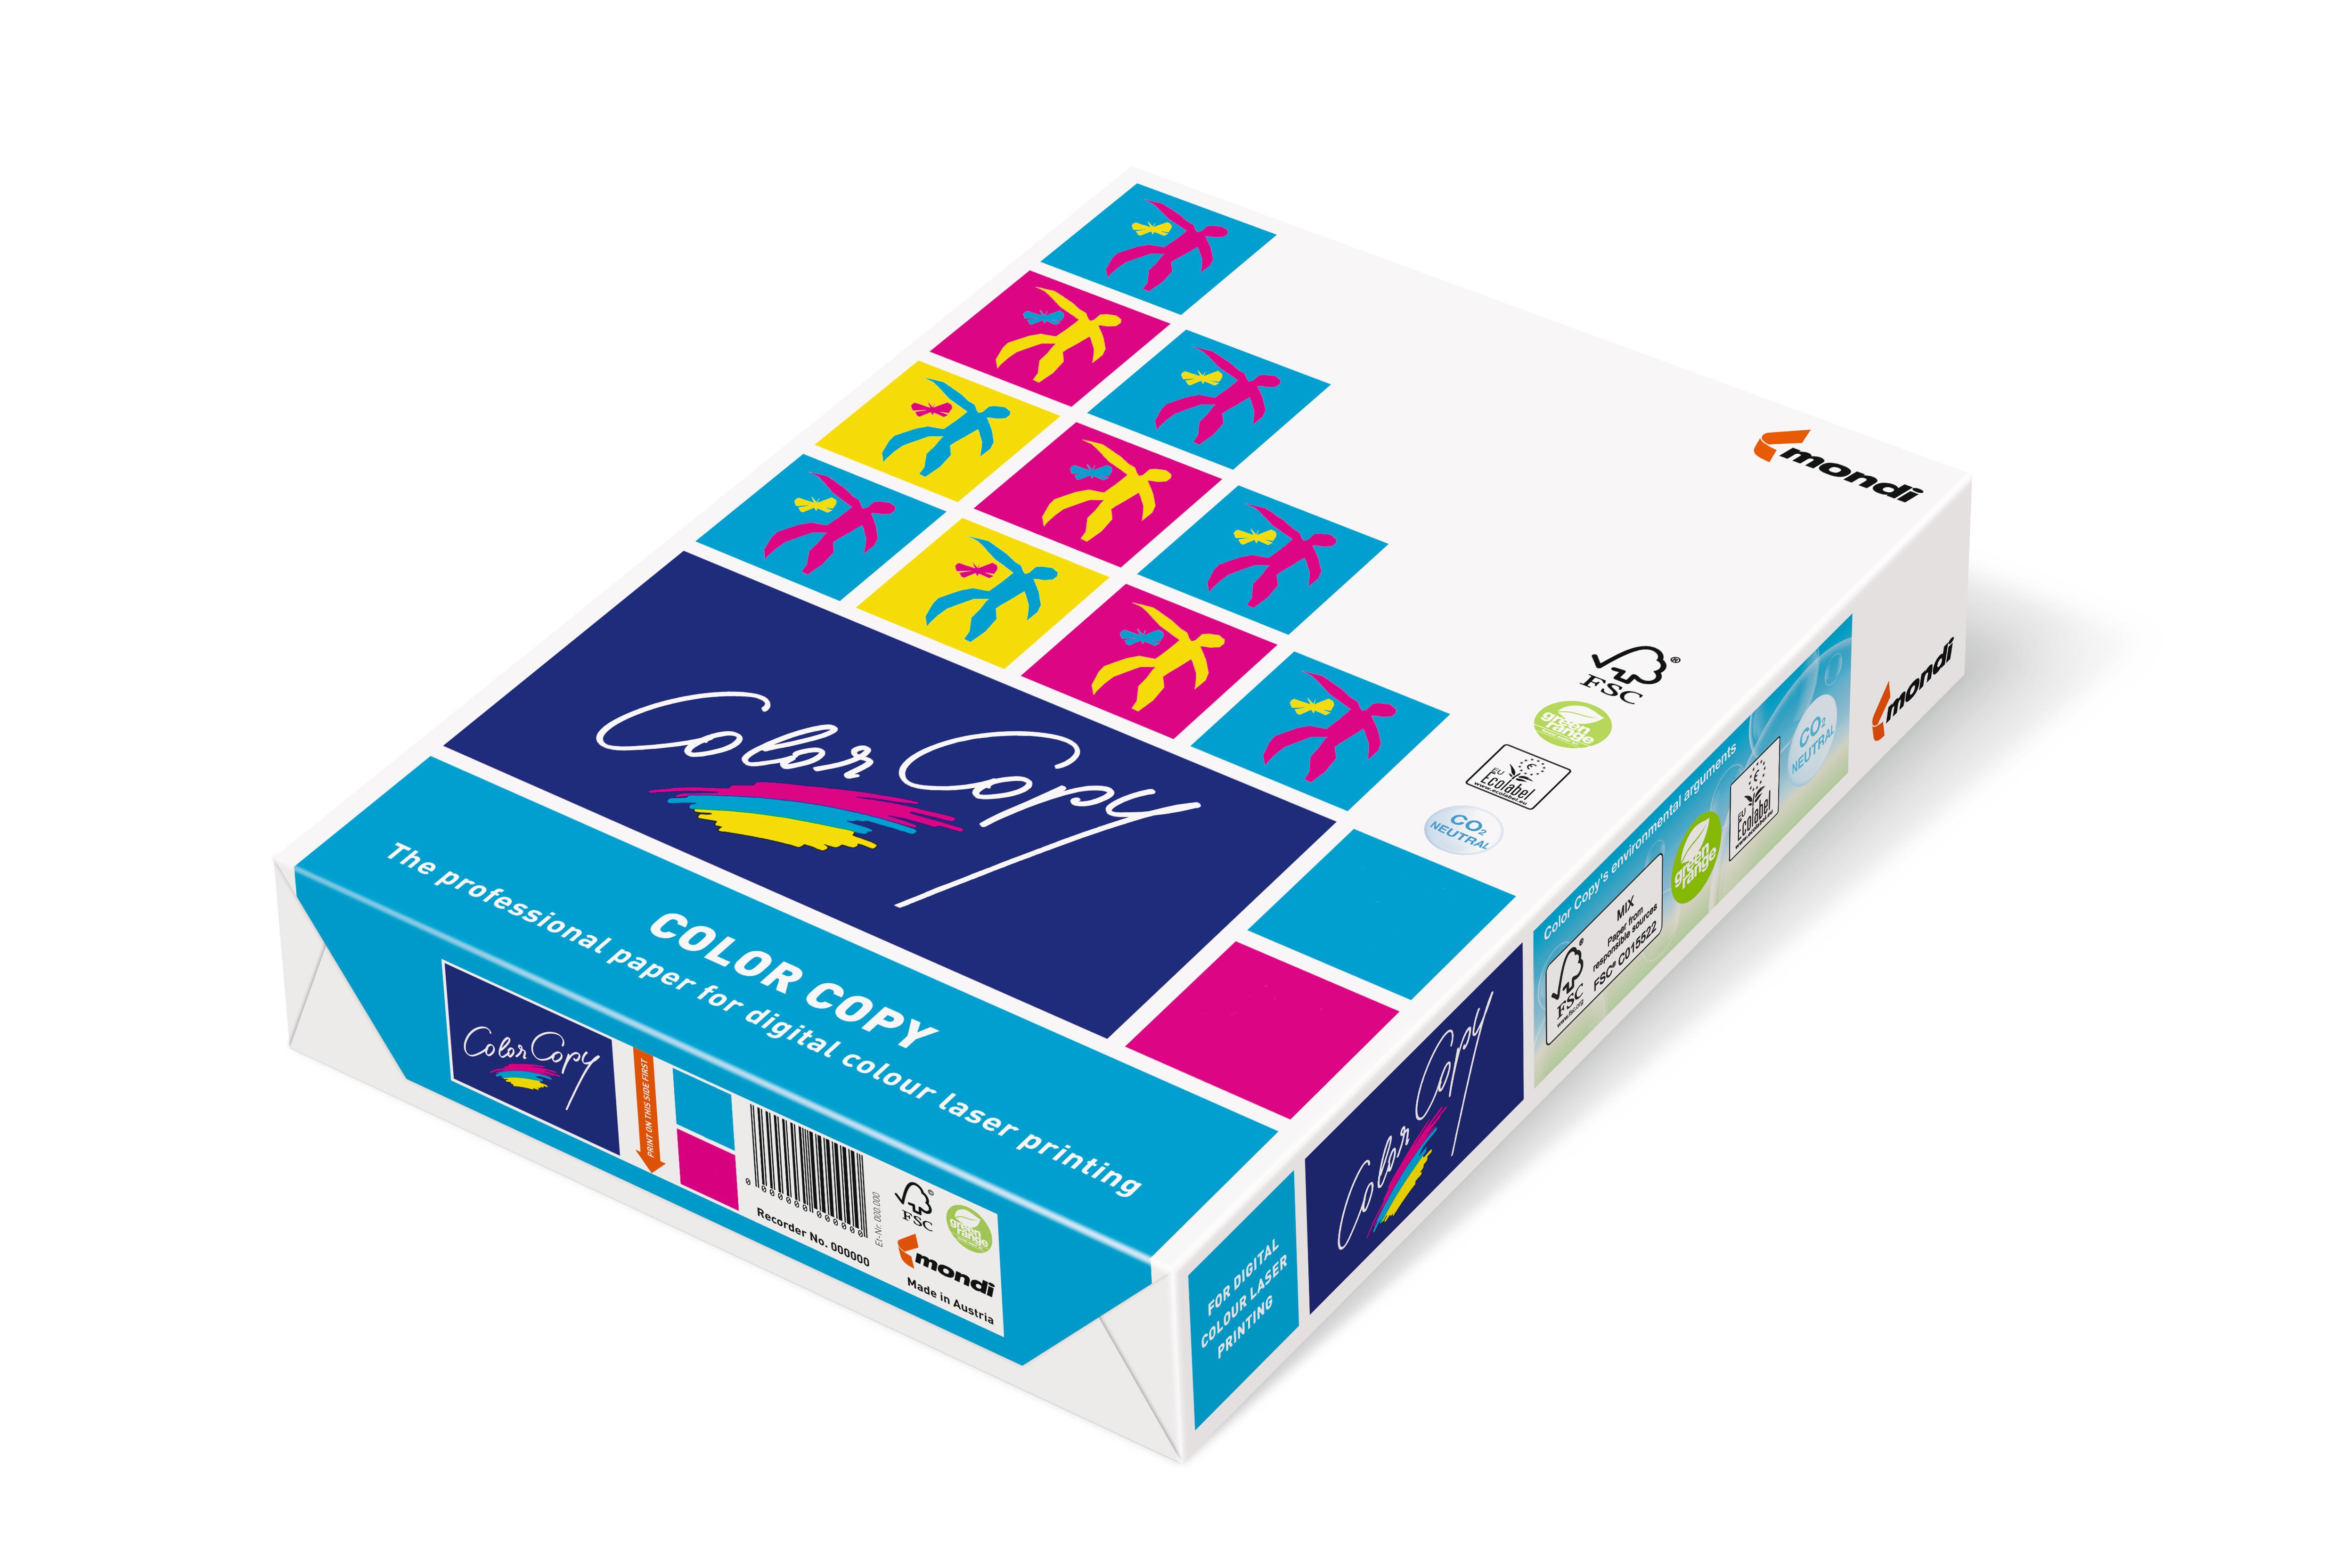 Vorschau: Mondi Color Copy Papier 90g/m² DIN-A4 - 500 Blatt weiß